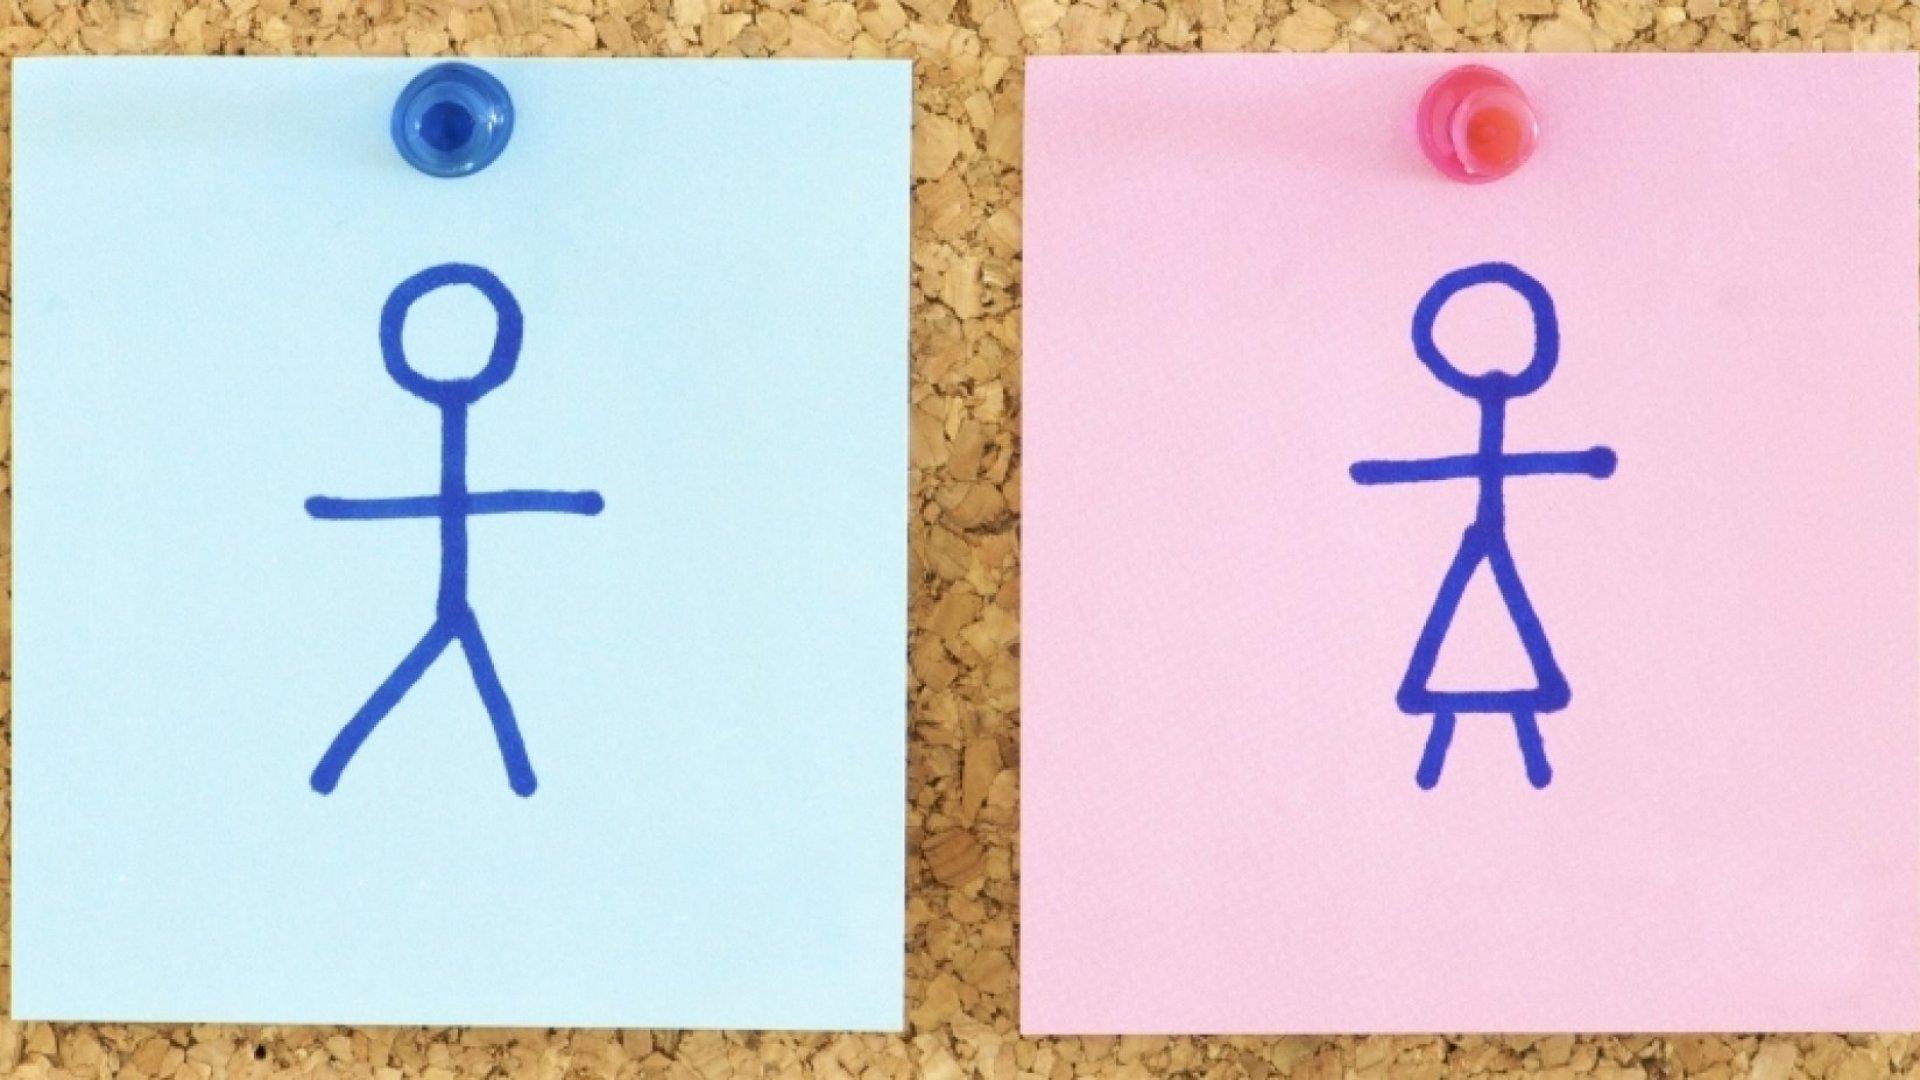 How to Avoid Gender Bias in Your Job Listings